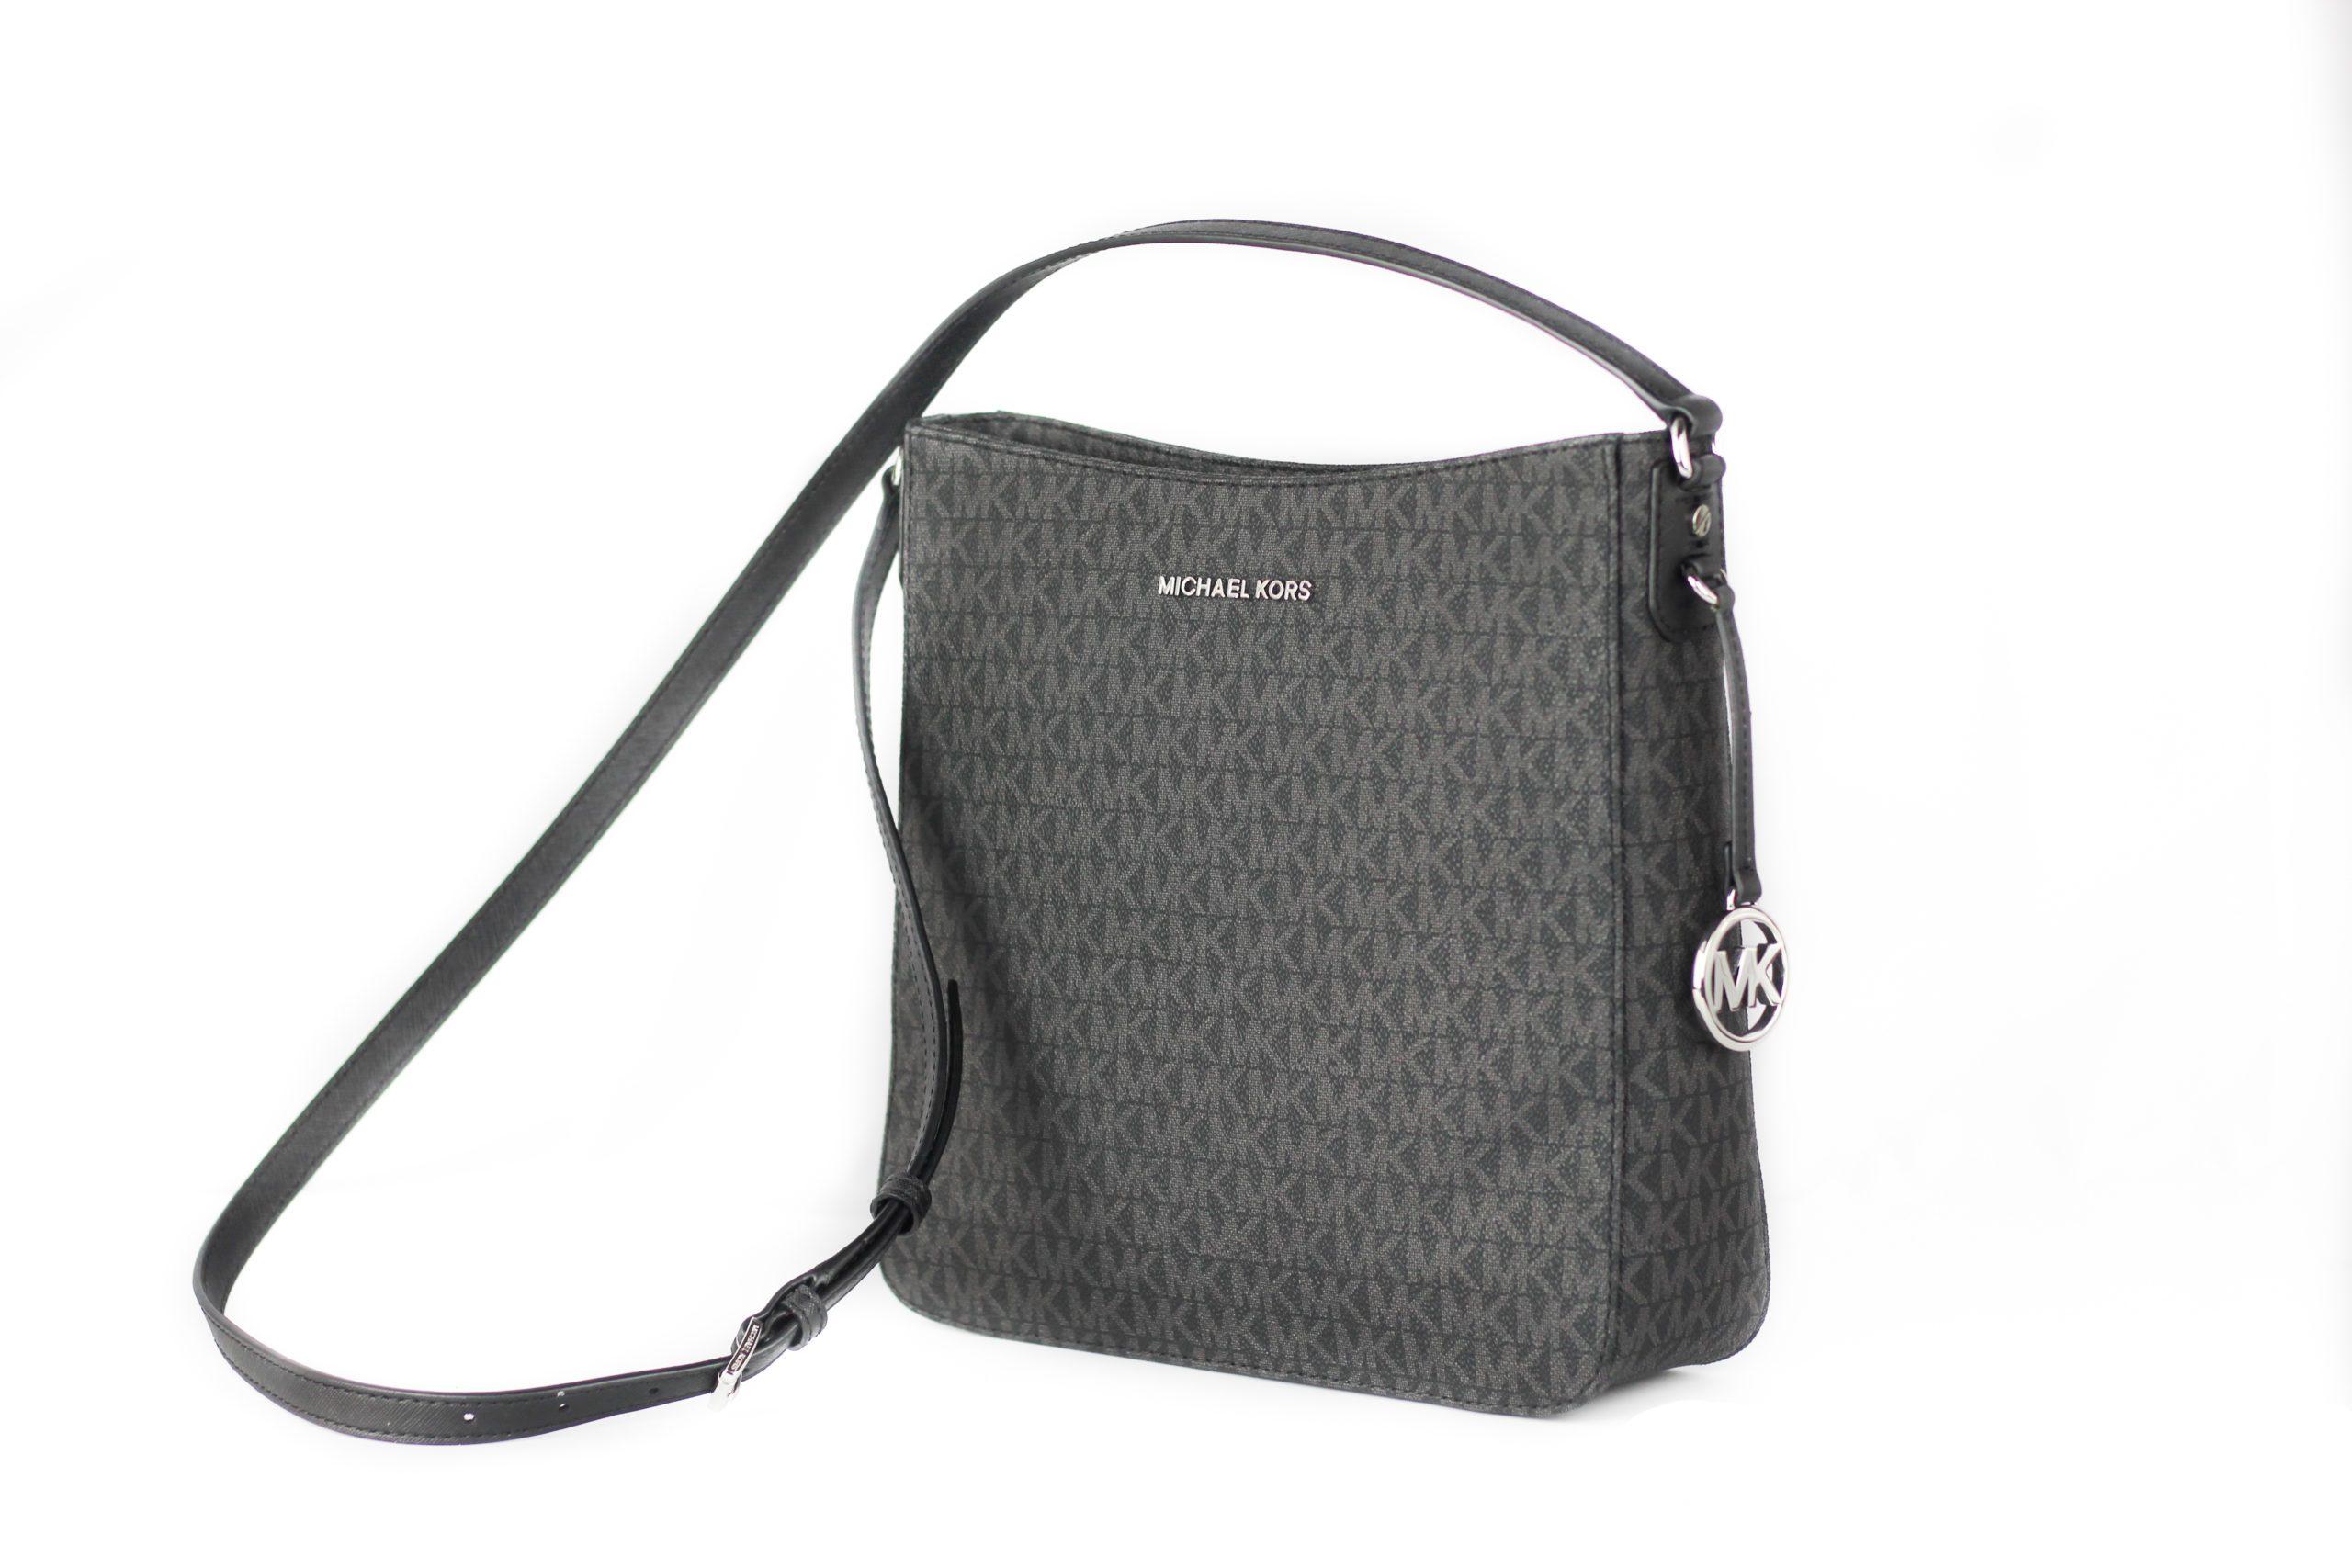 Michael Kors Women's Jet Set Crossbody Bag Black 82509